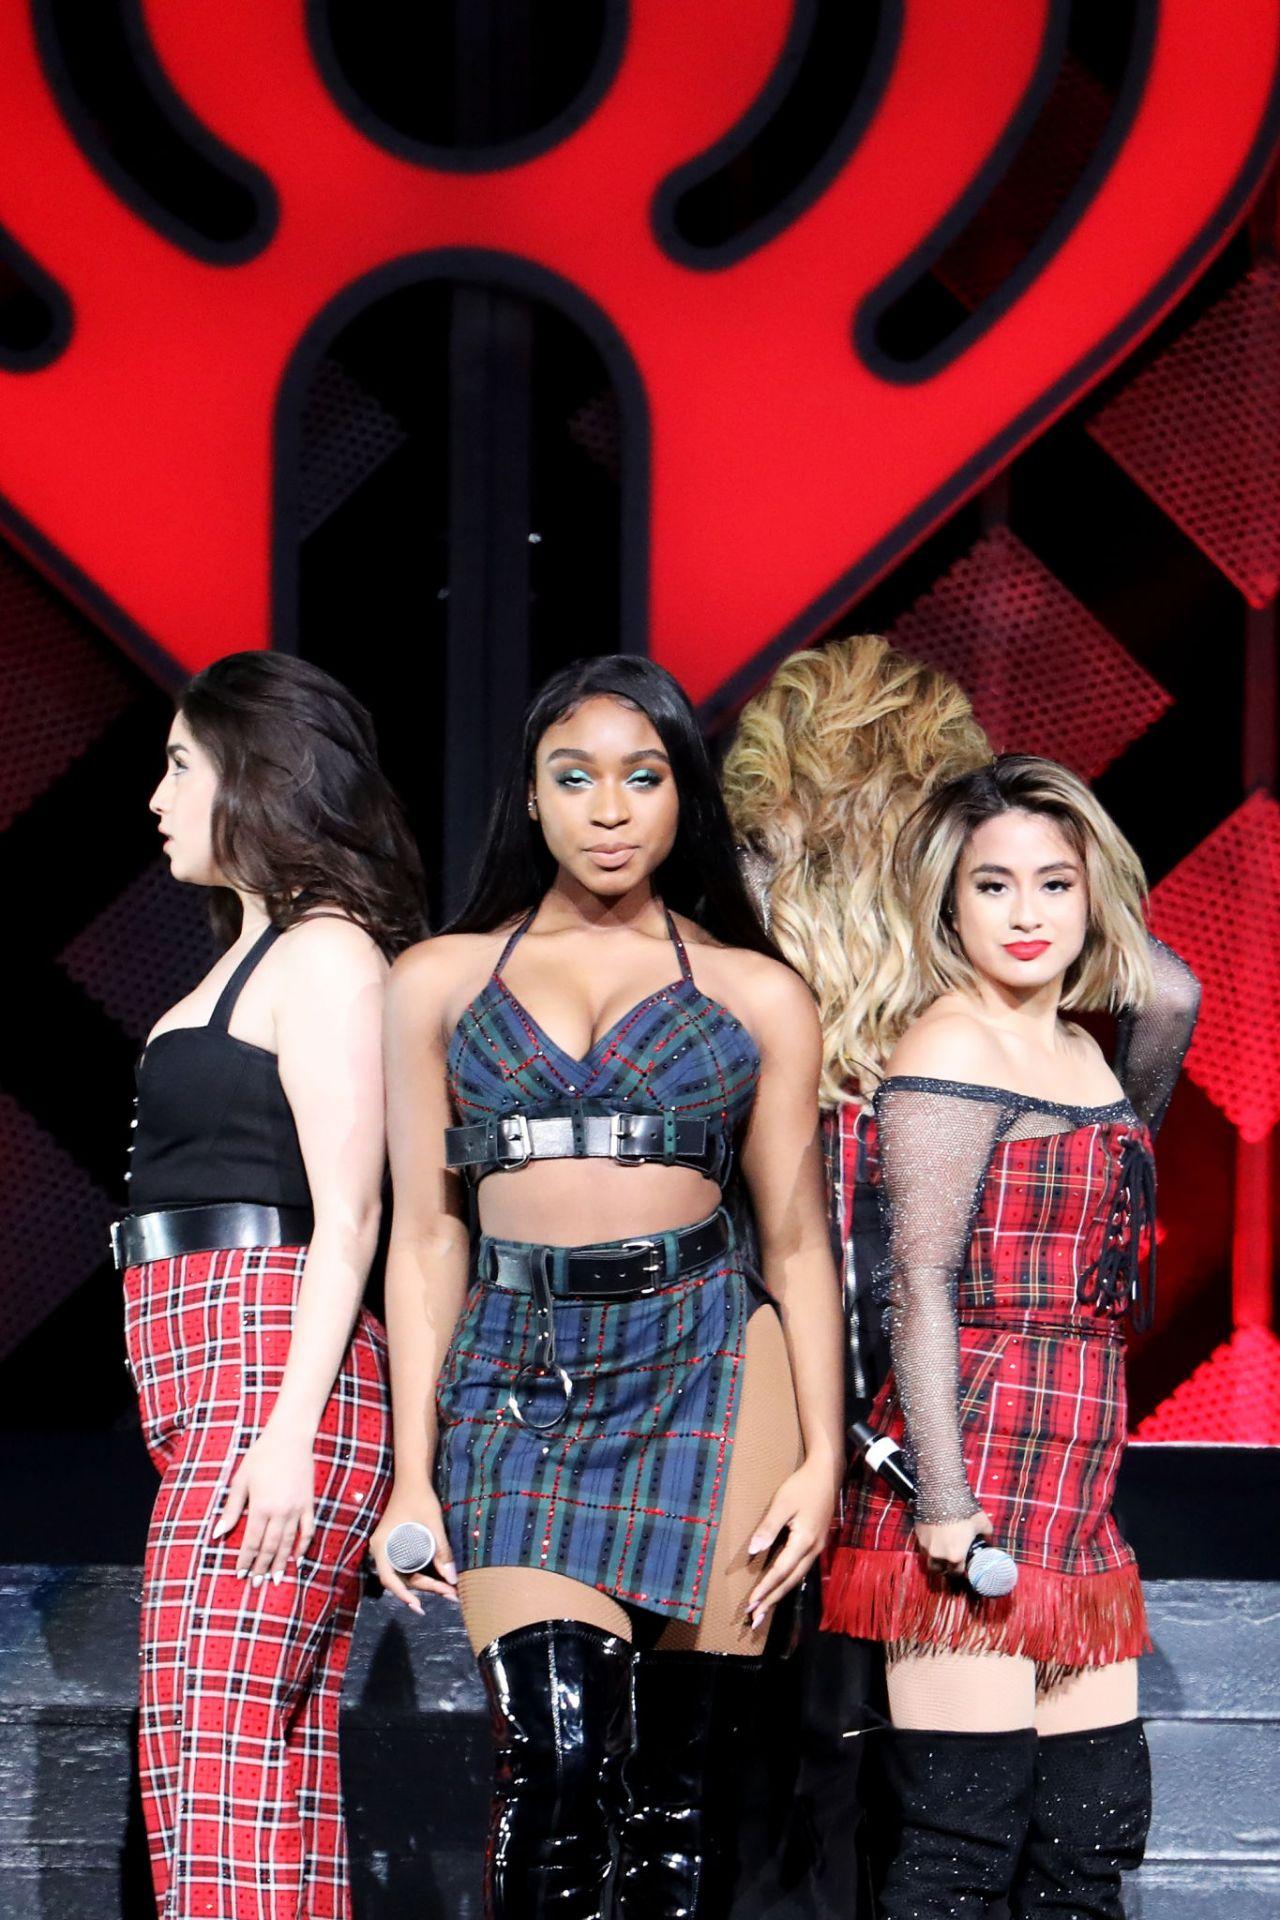 Fifth Harmony Kiss 108 S Jingle Ball 2017 In Boston